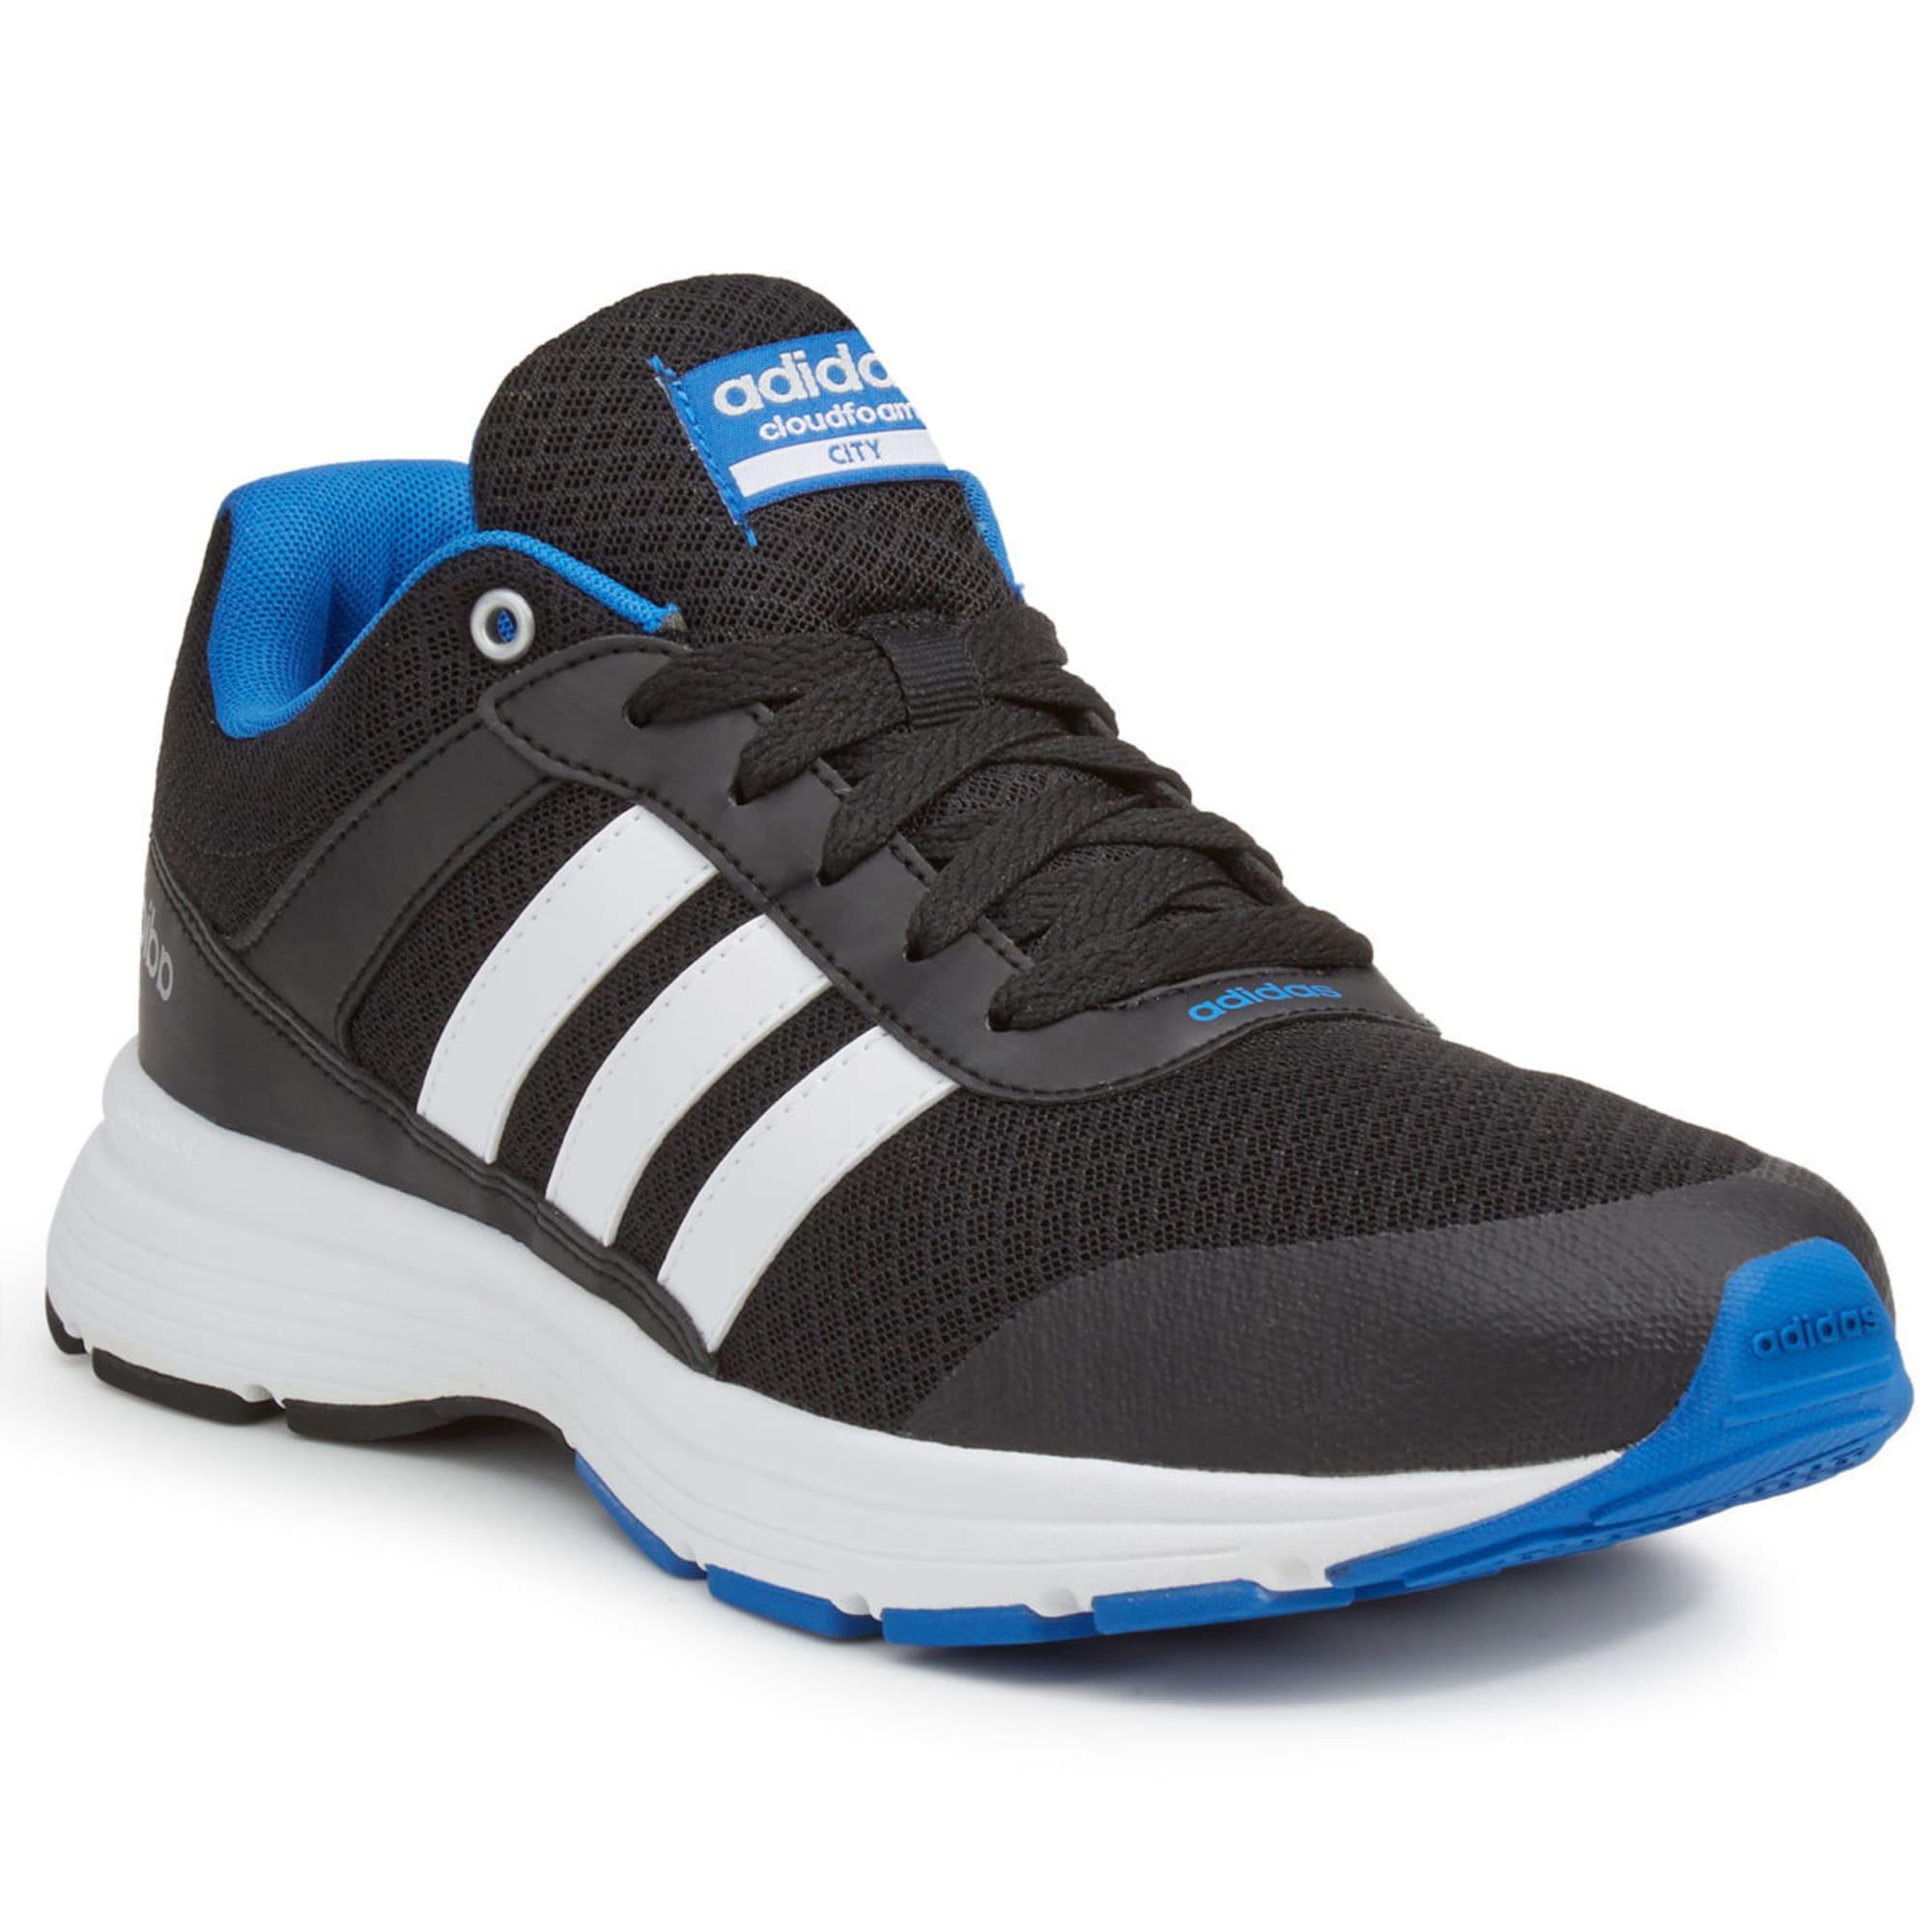 ADIDAS Men's Cloudfoam VS City Running Shoes, Black/Blue